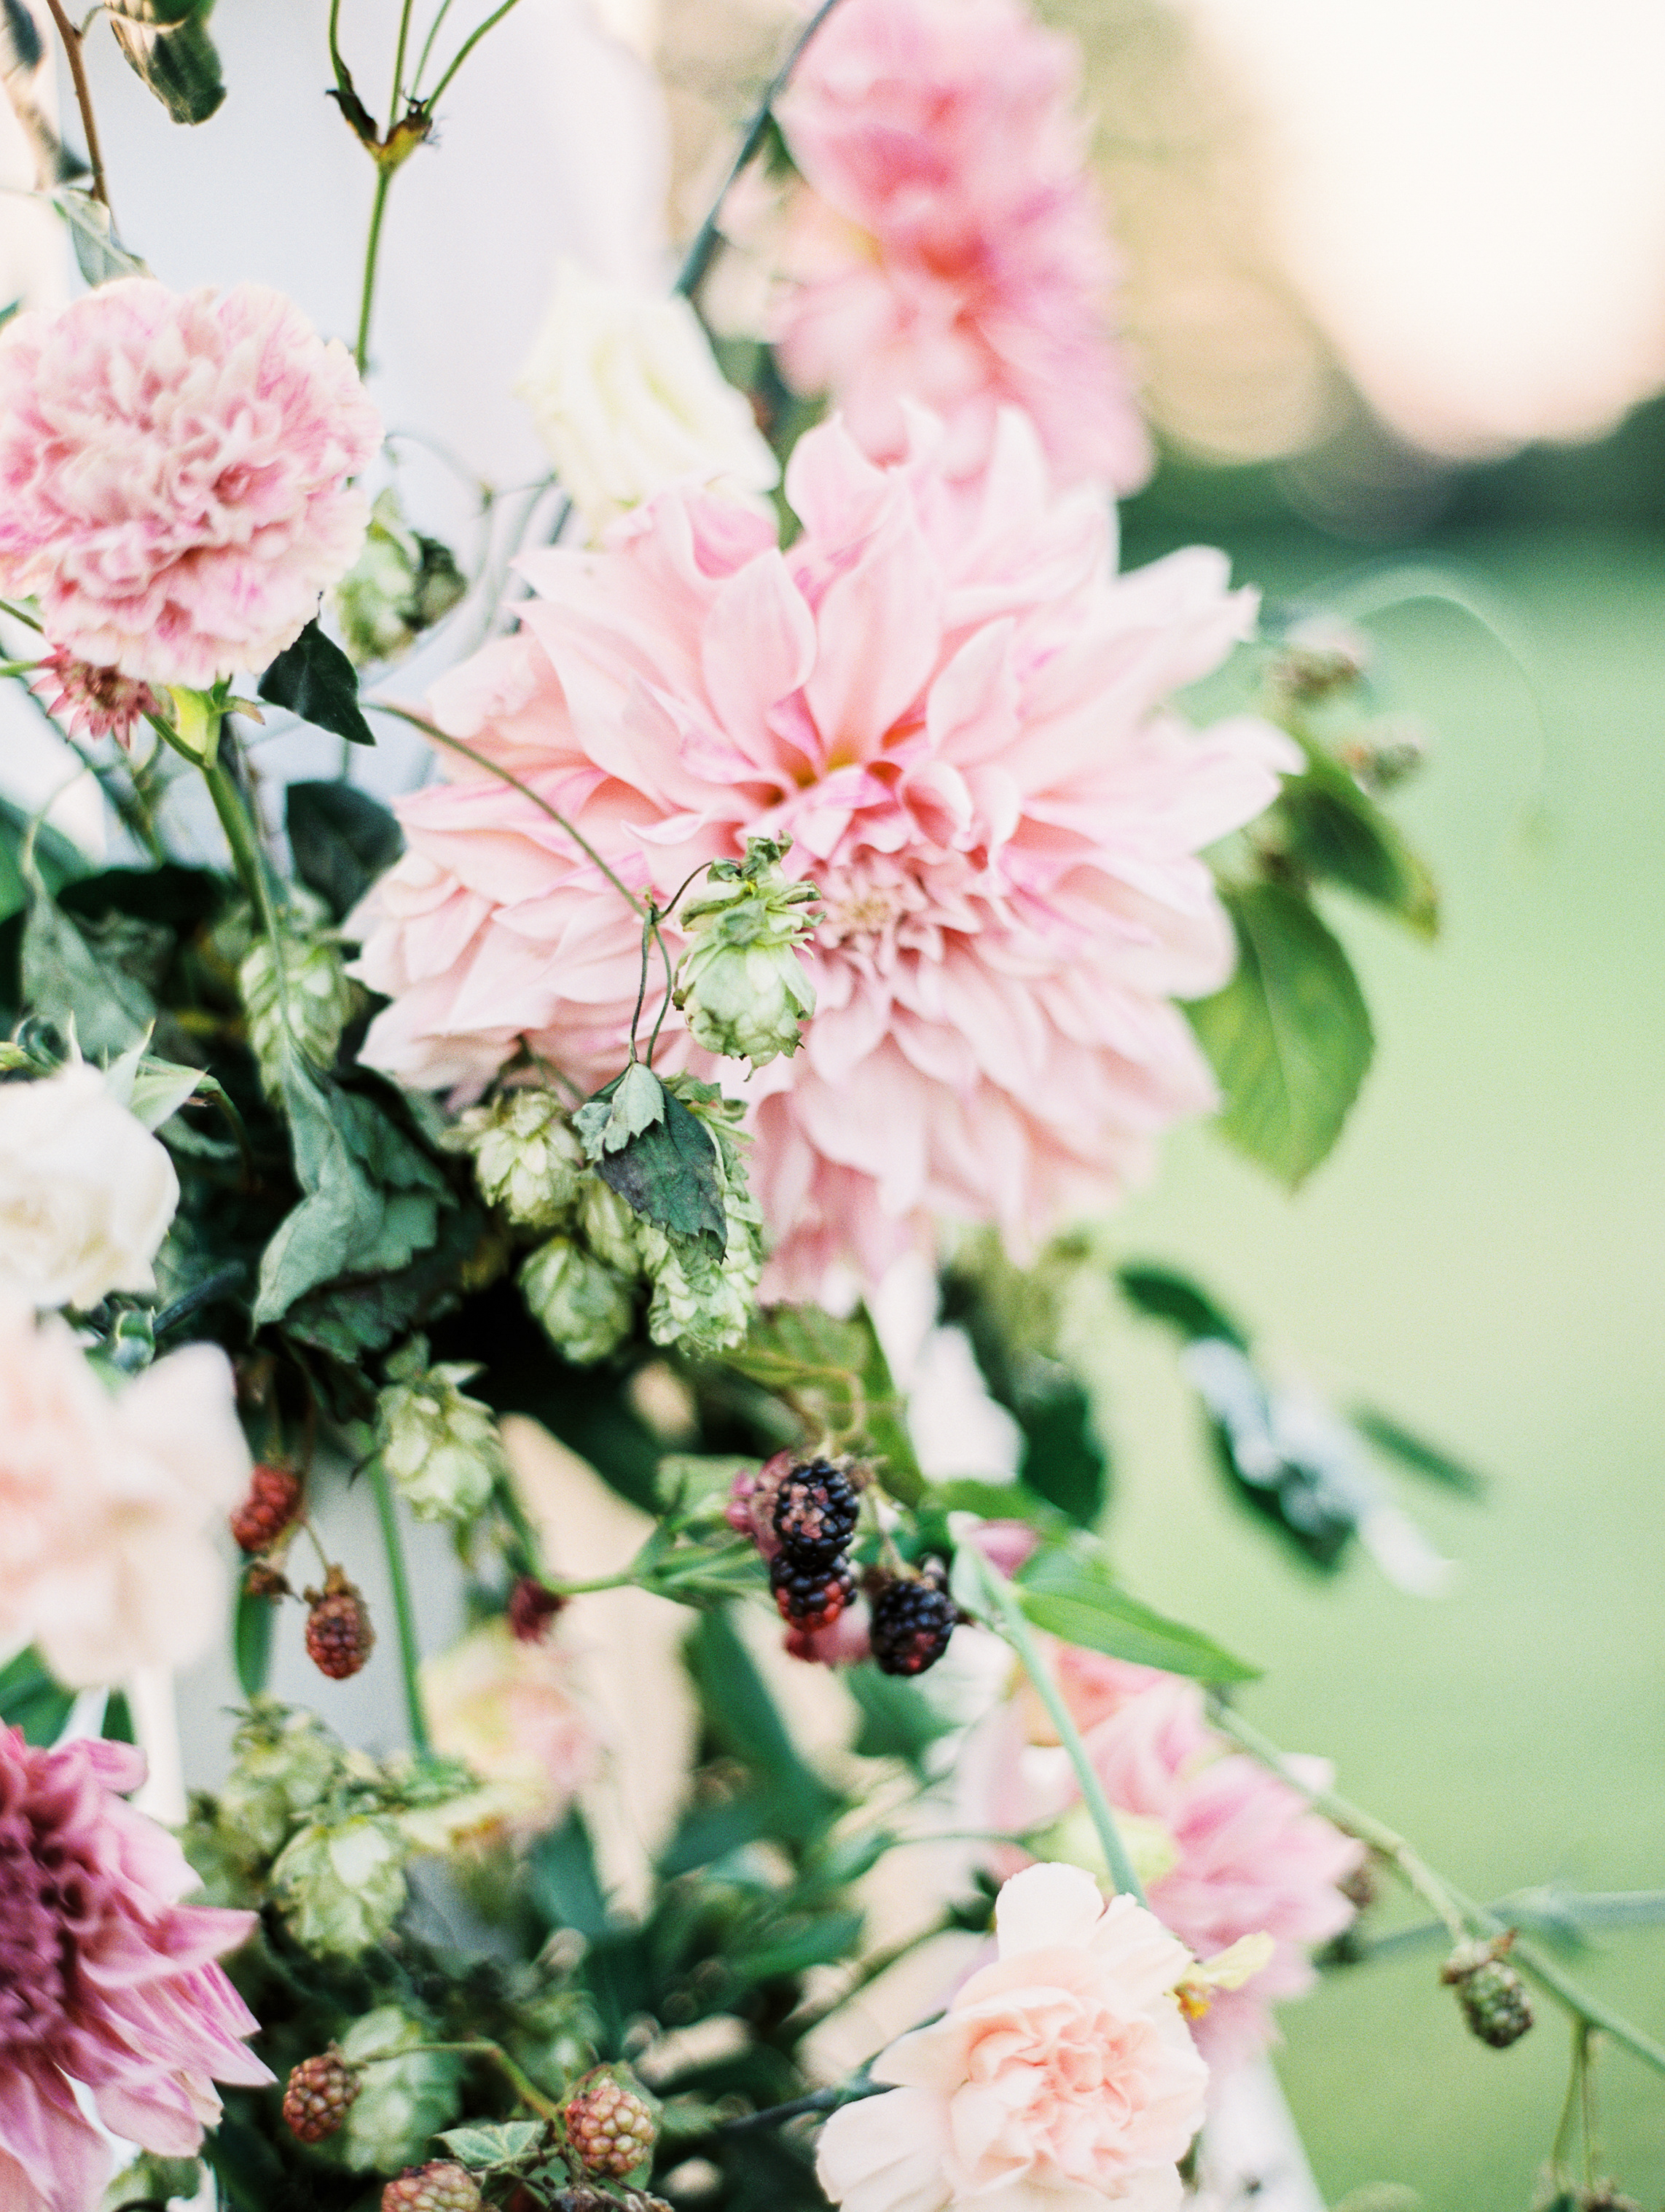 Zoller+Wedding+Ceremonyf-25.jpg